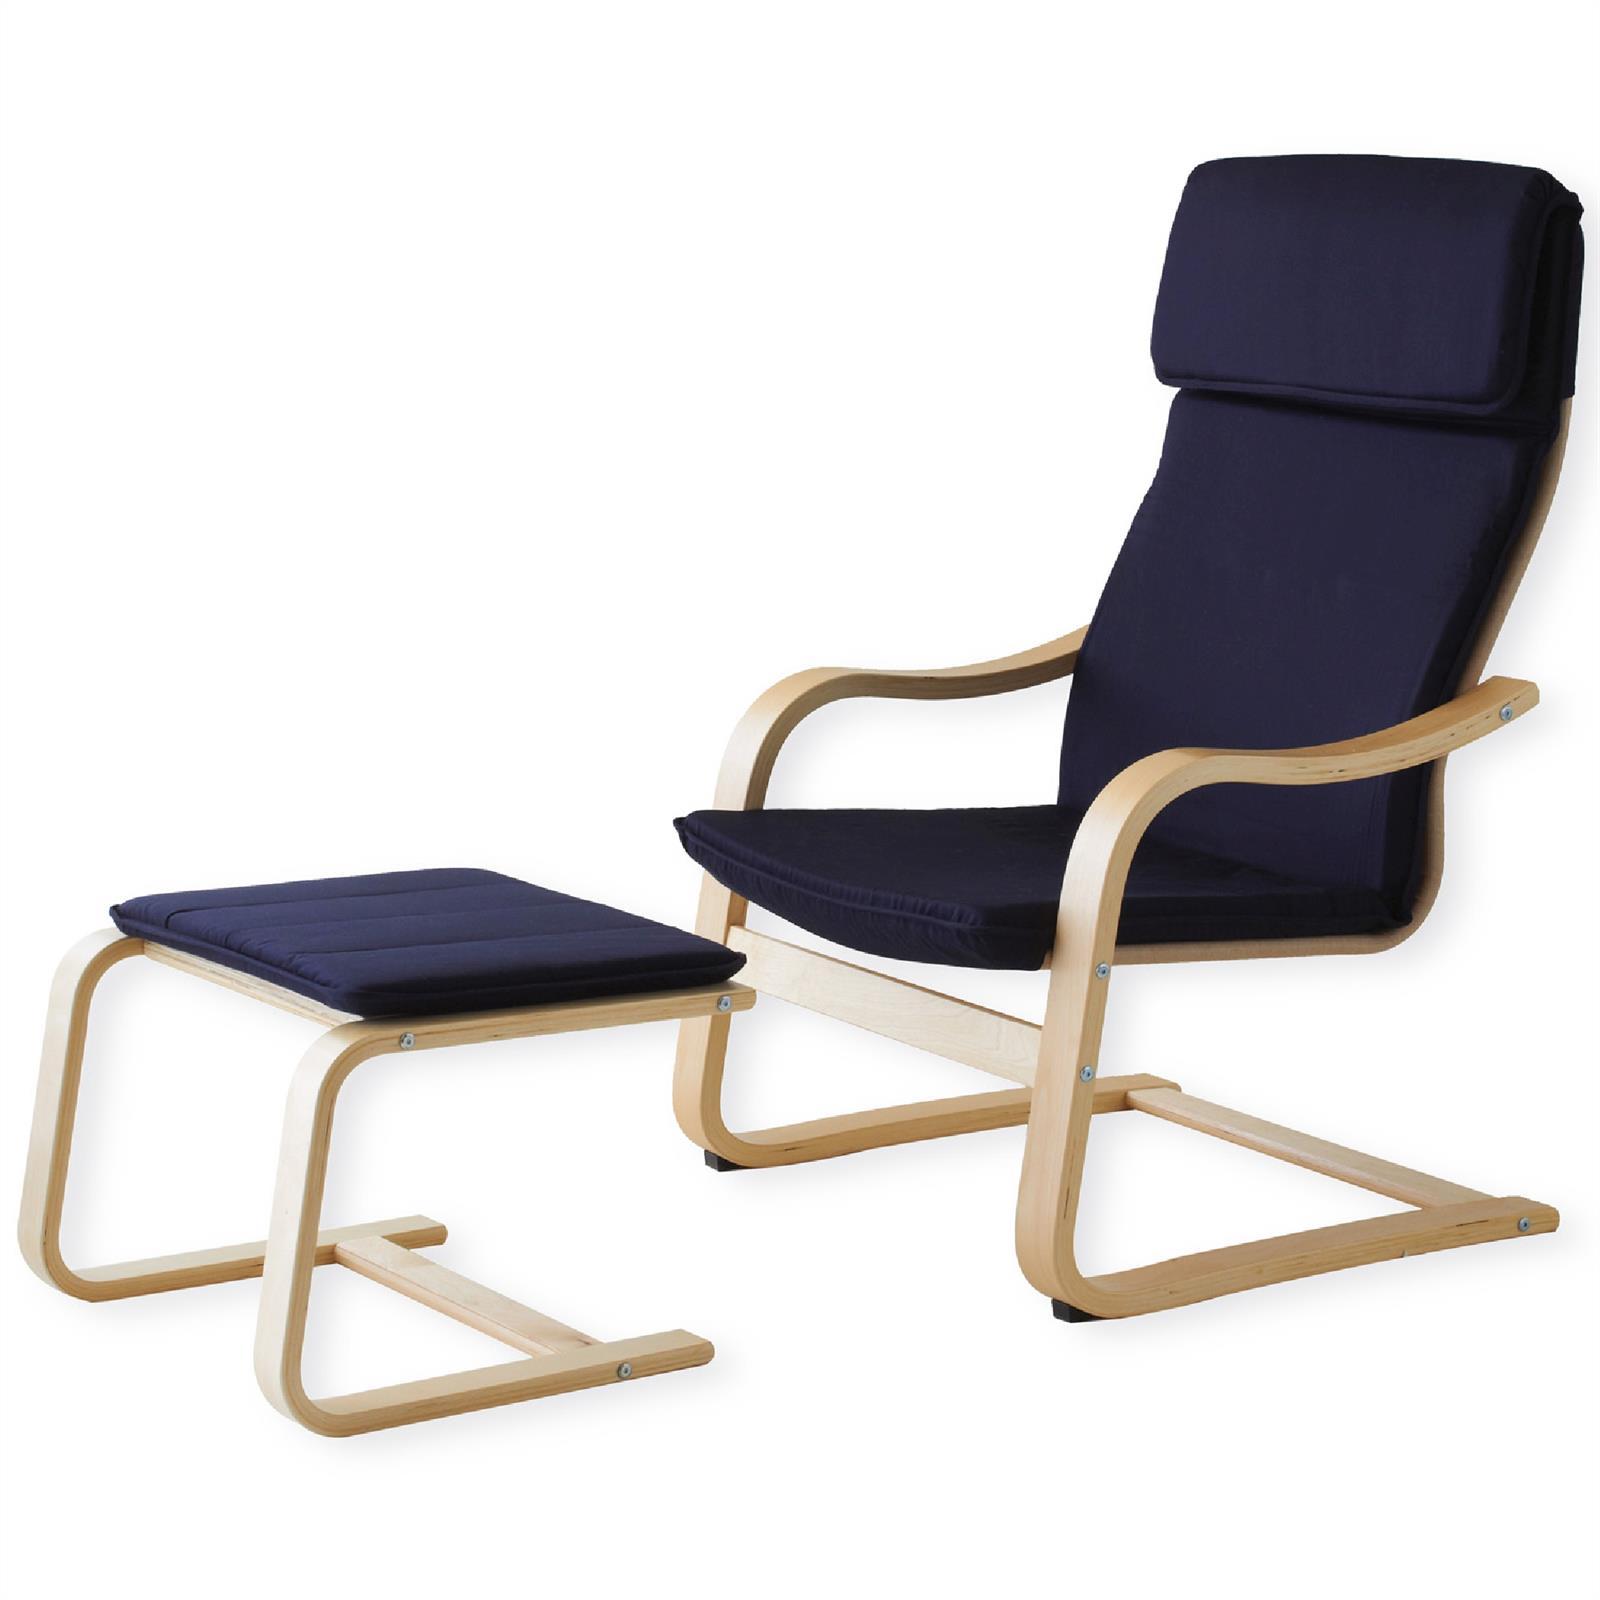 schwingsessel mit hocker schwingsessel mit hocker in versch farben caro m bel schwingsessel. Black Bedroom Furniture Sets. Home Design Ideas